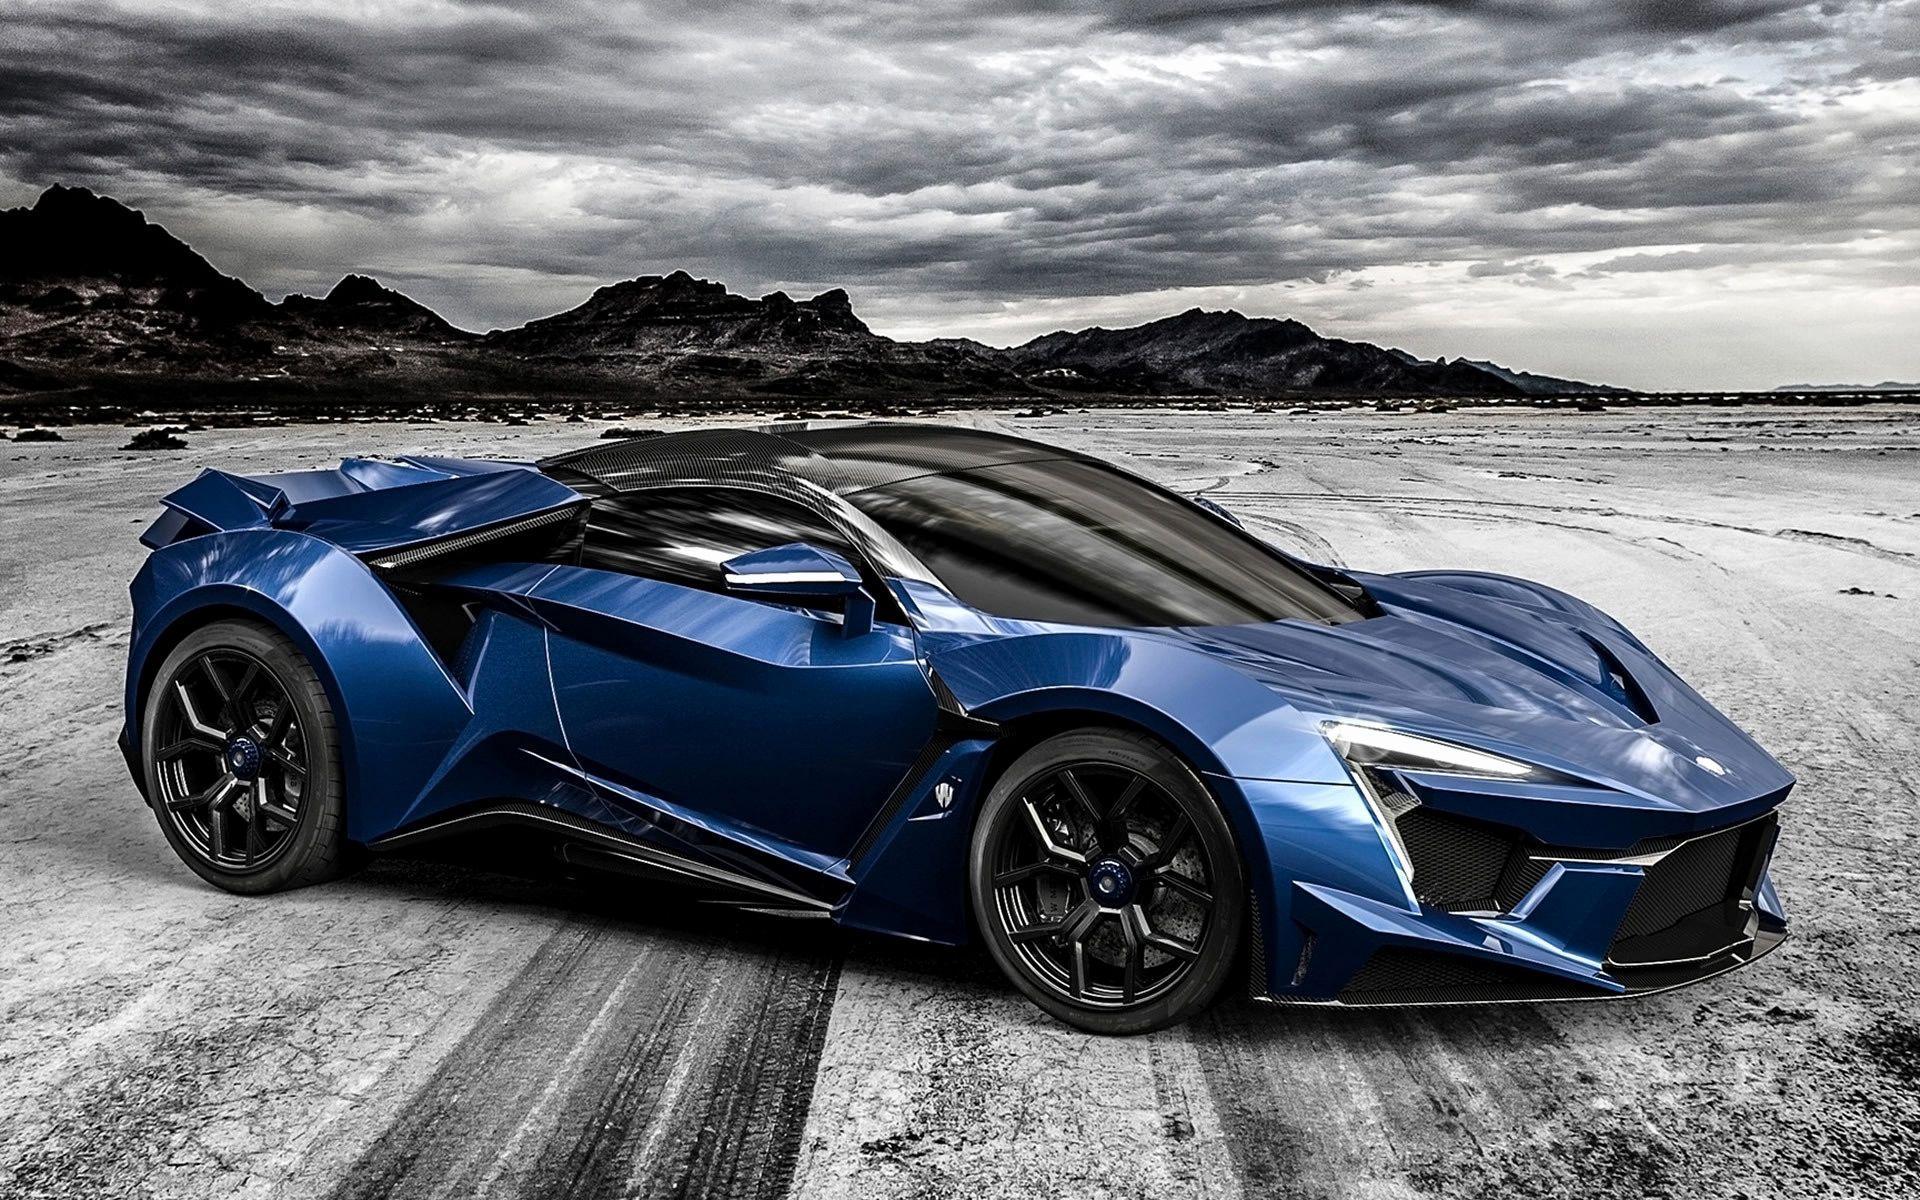 Top 10 Car Wallpapers Top Free Top 10 Car Backgrounds